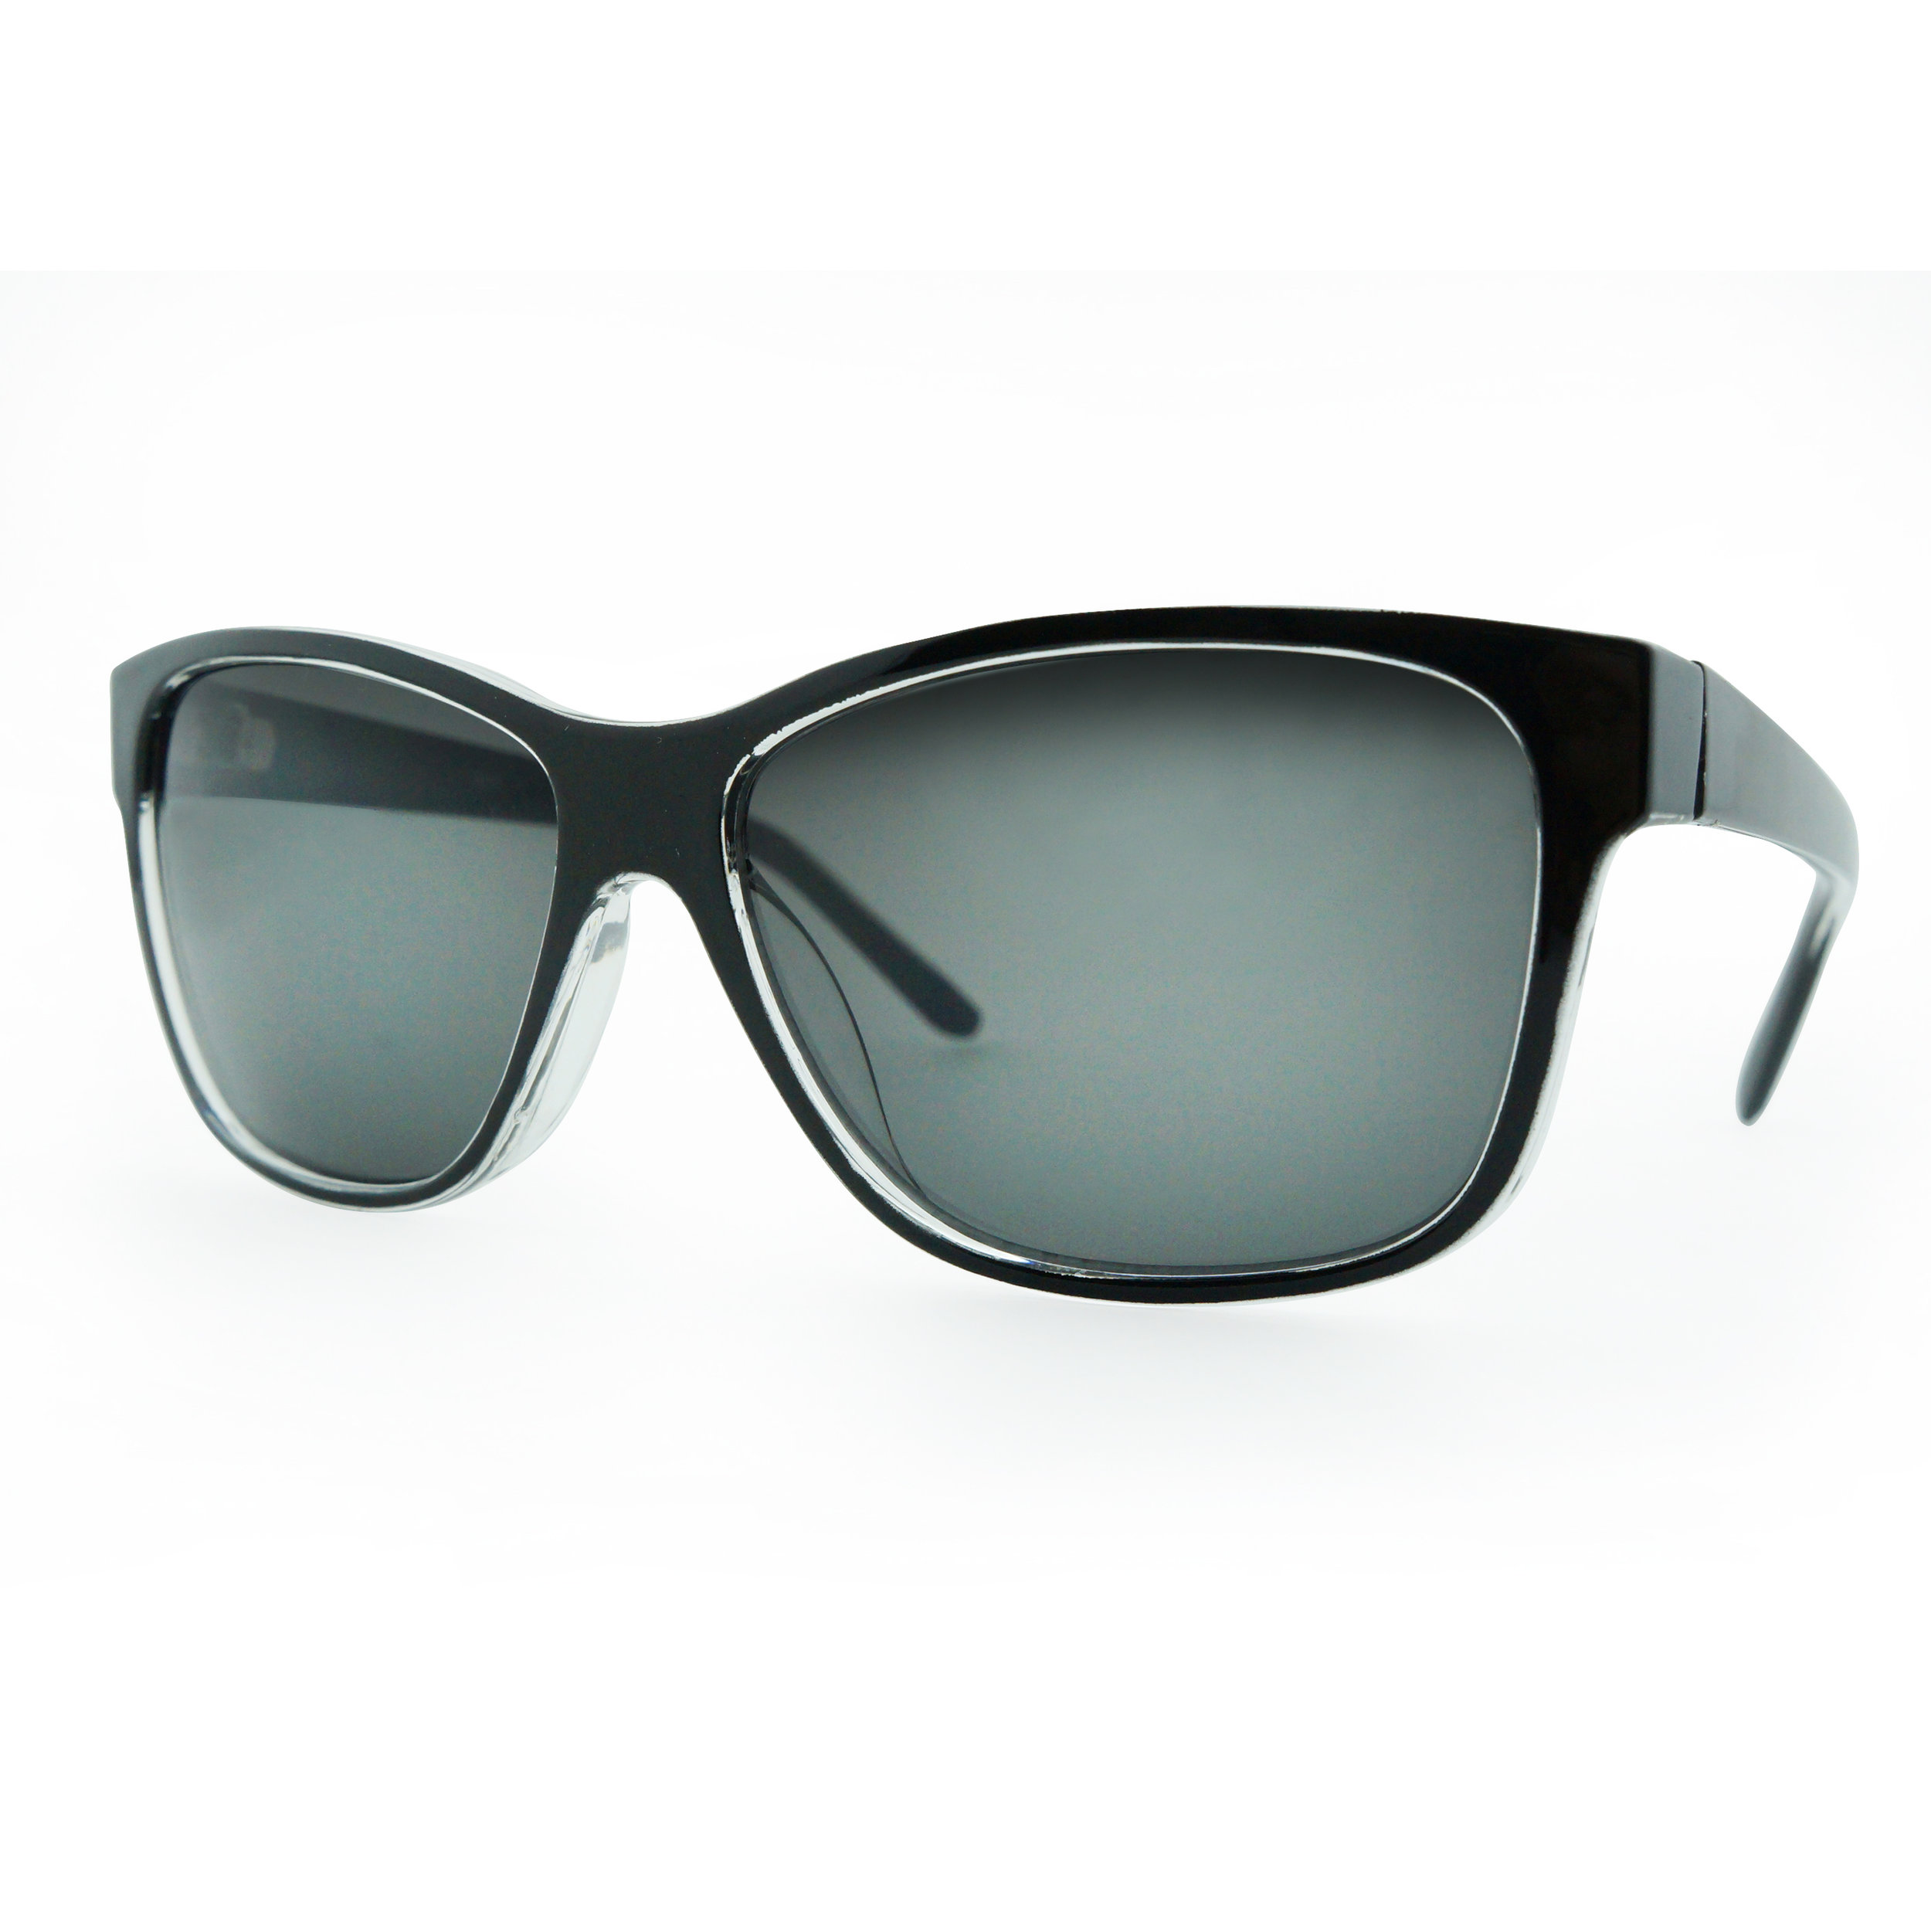 3700-Shinny Black-E001-Side1.jpg